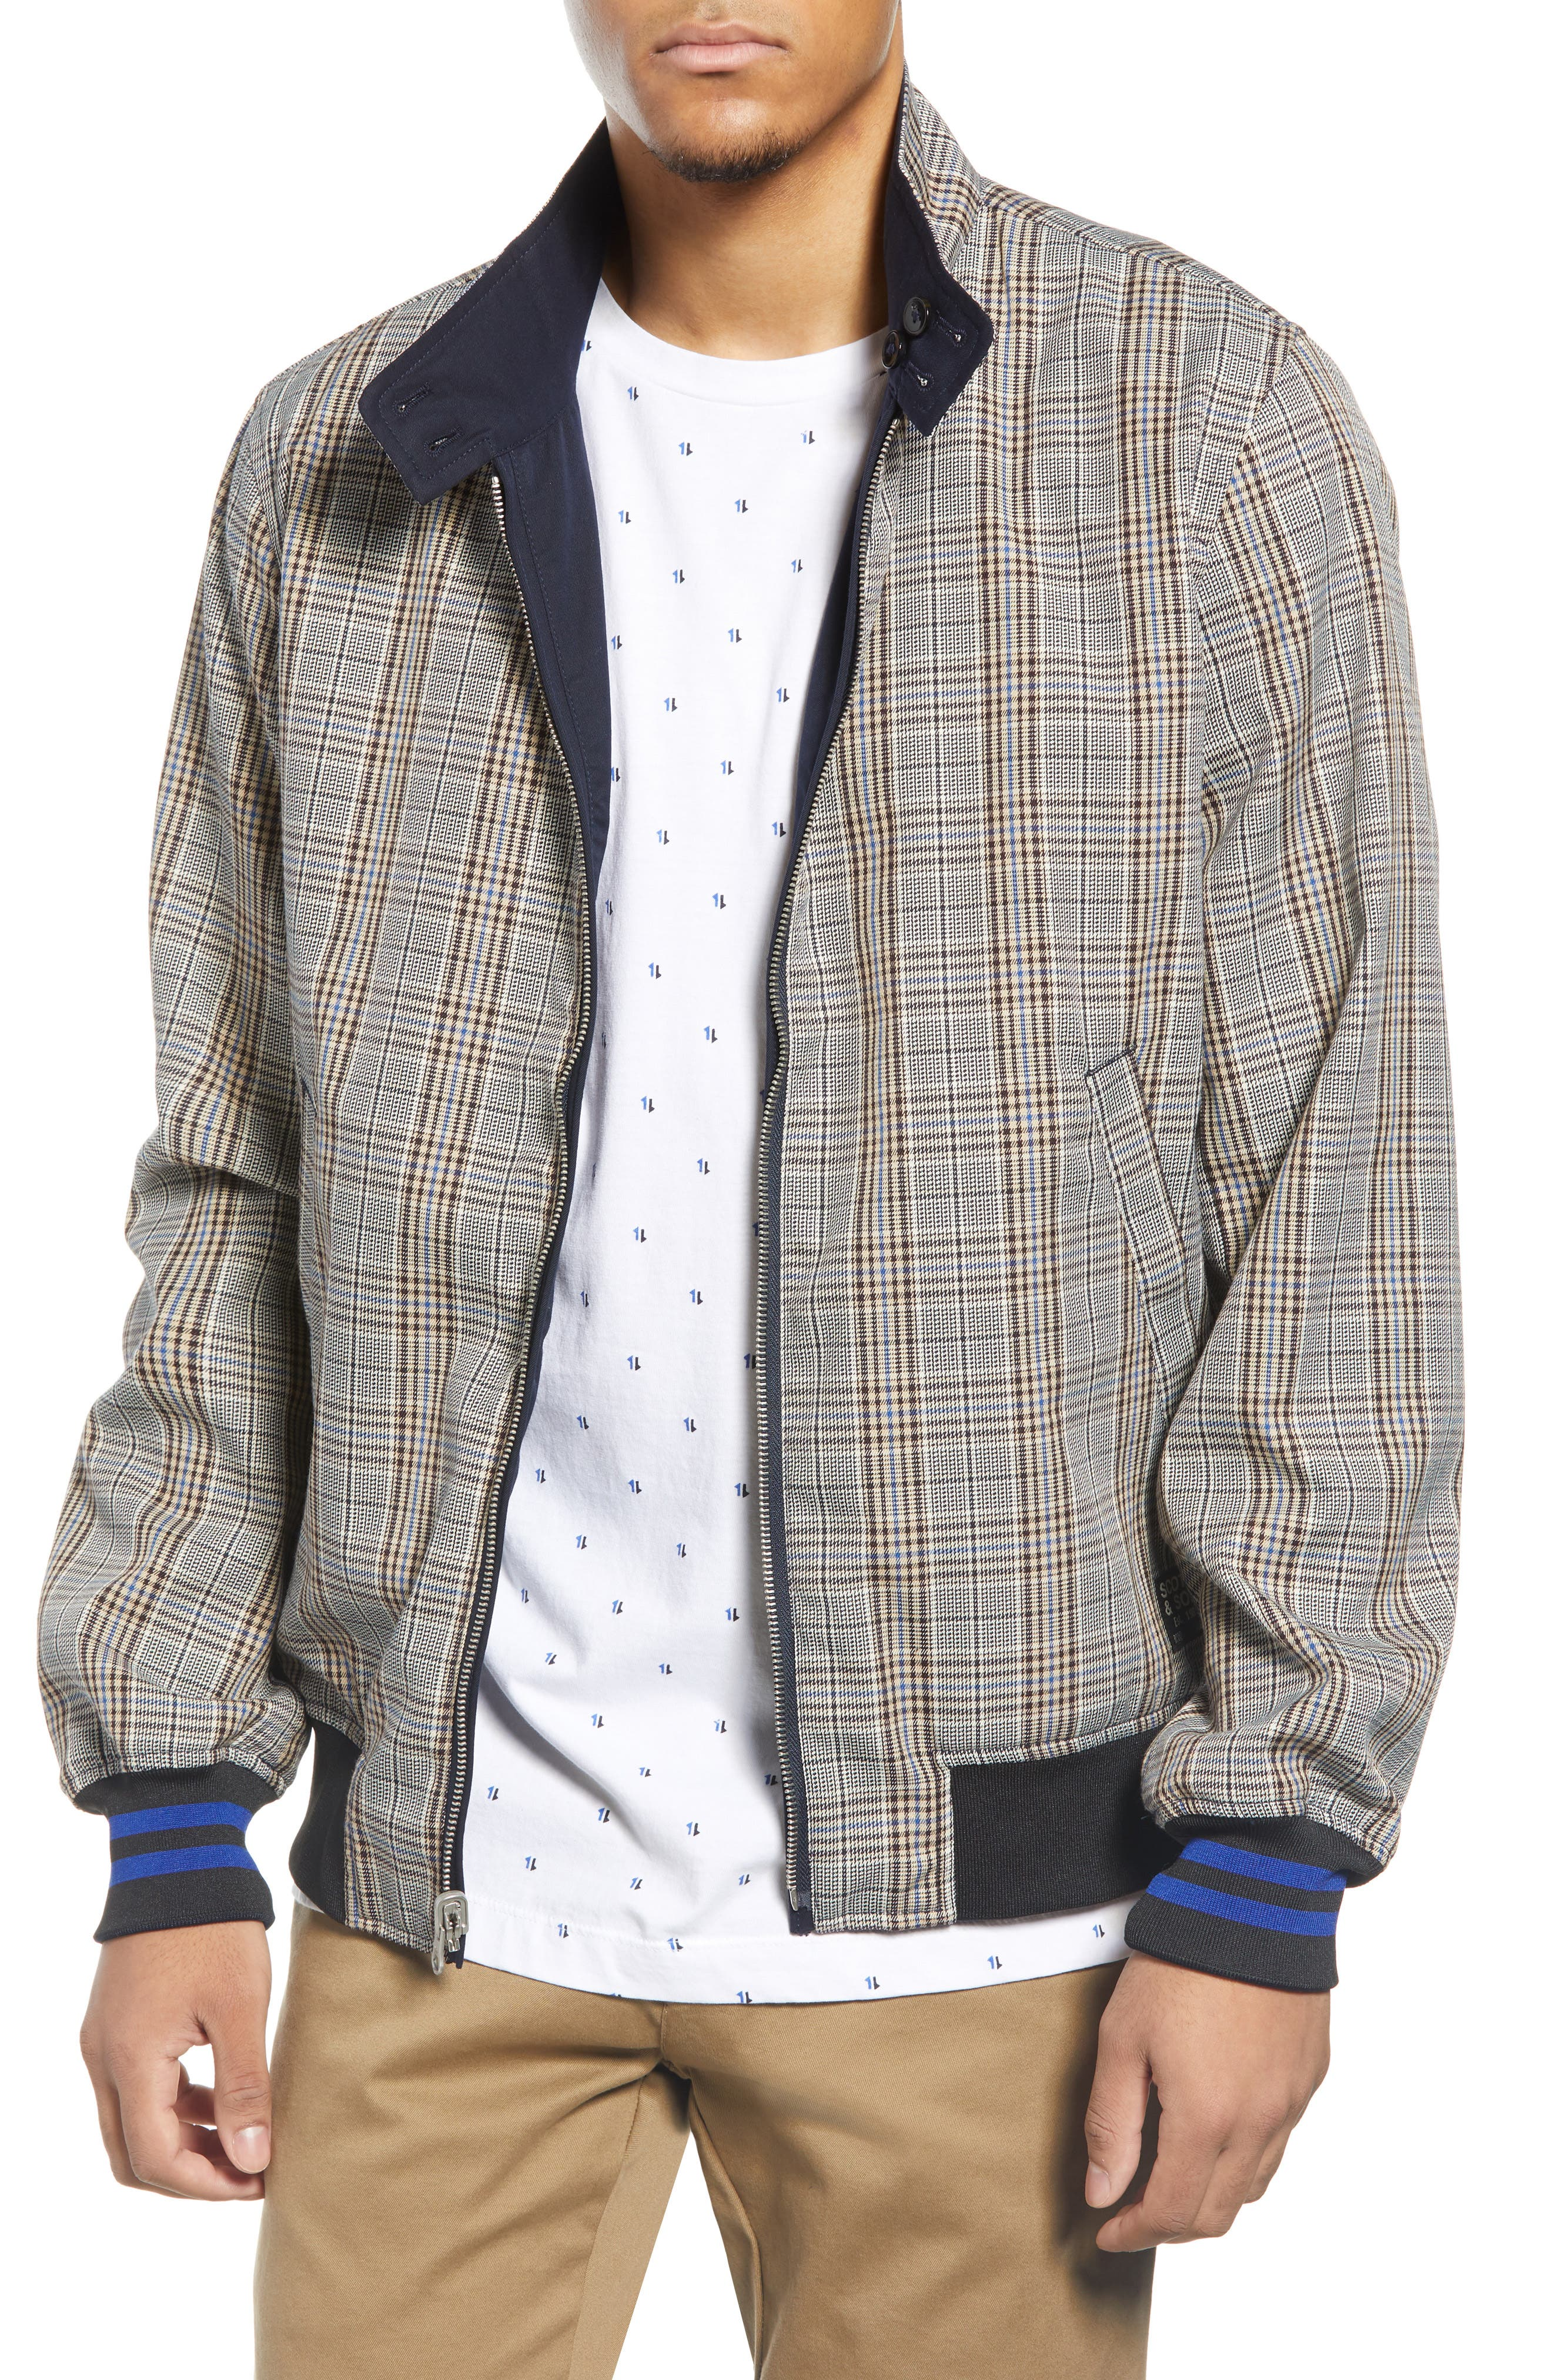 Men's Vintage Style Coats and Jackets Mens Scotch  Soda Reversible Zip Jacket $124.00 AT vintagedancer.com